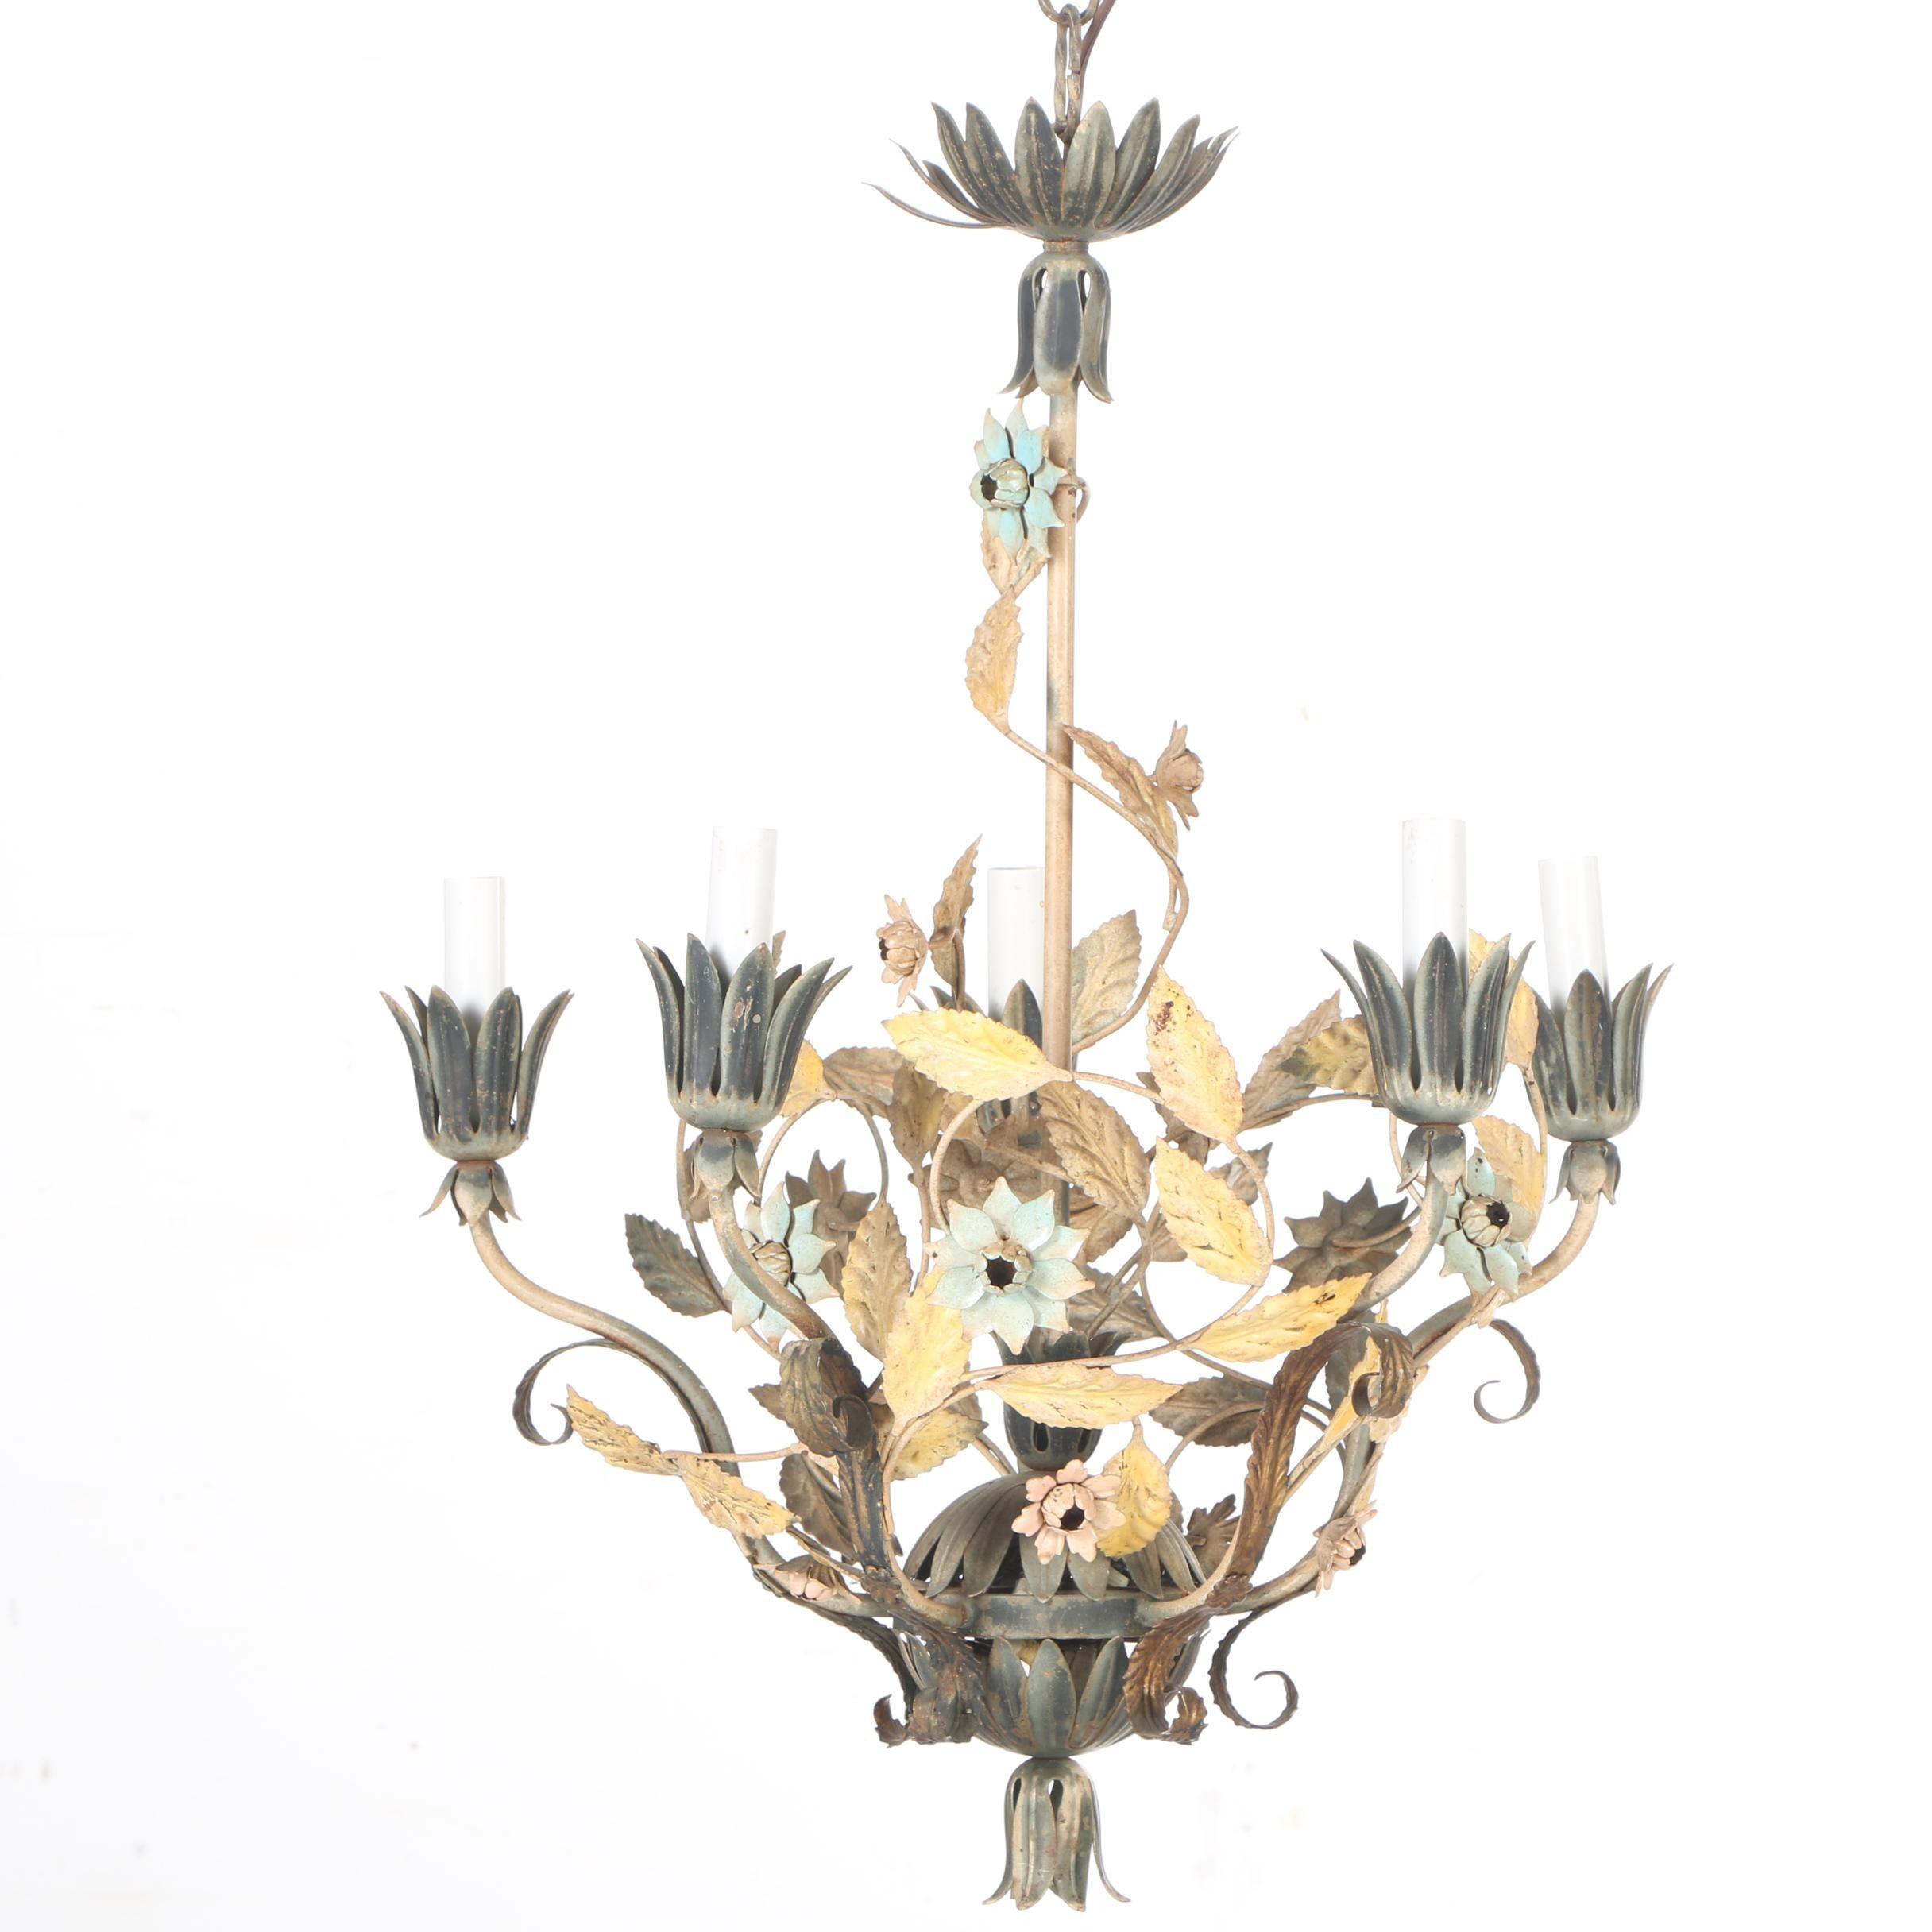 Vintage Painted Tole Floral Chandelier